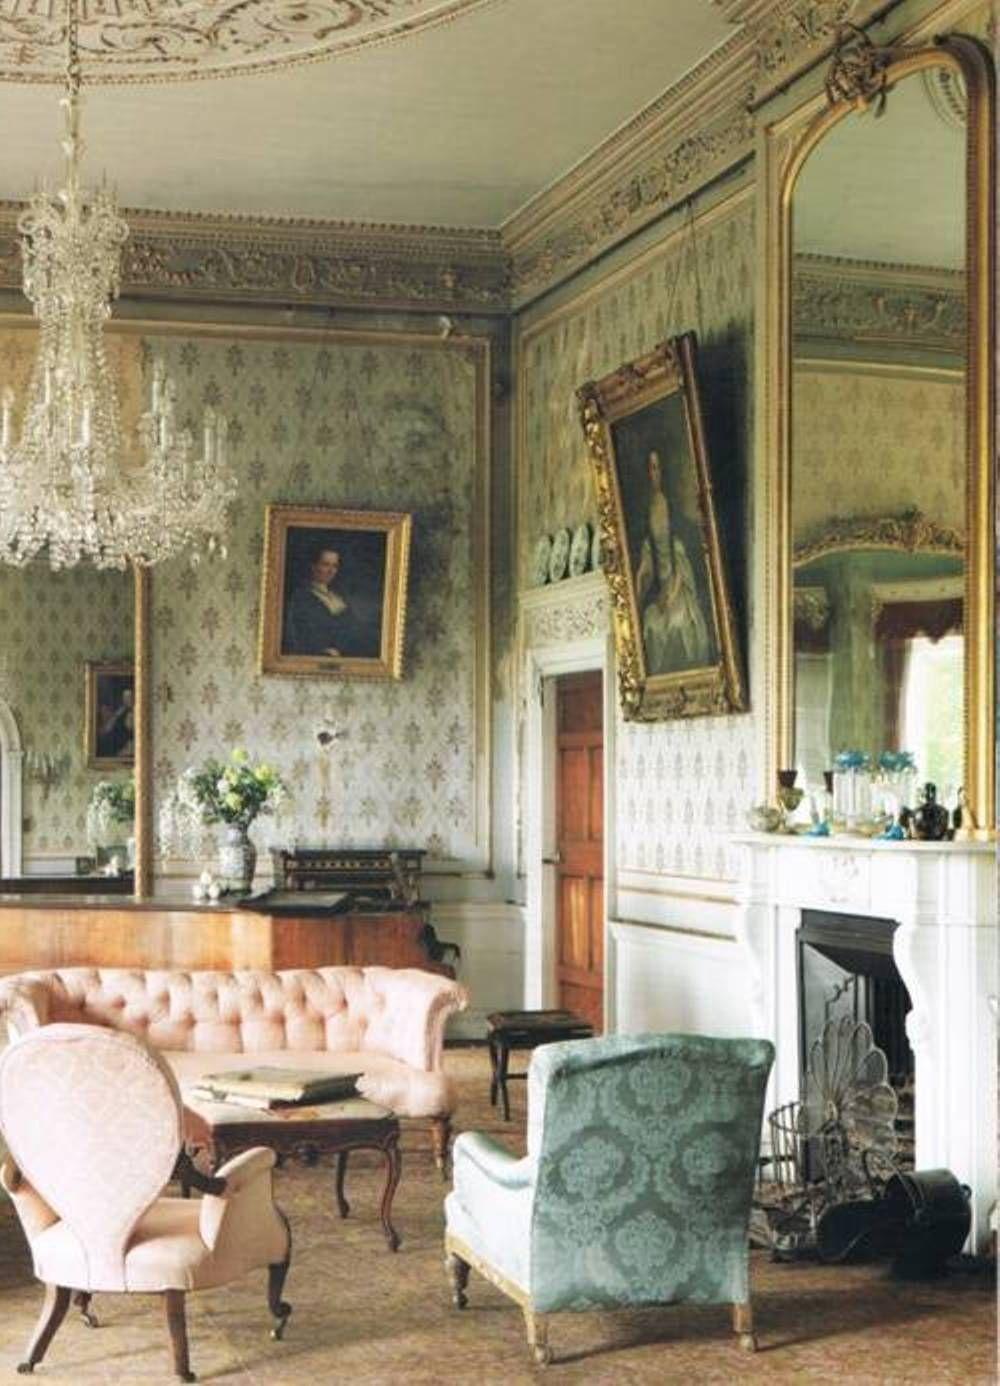 victorian house interior designs in 2019 extravagant home interior rh pinterest com